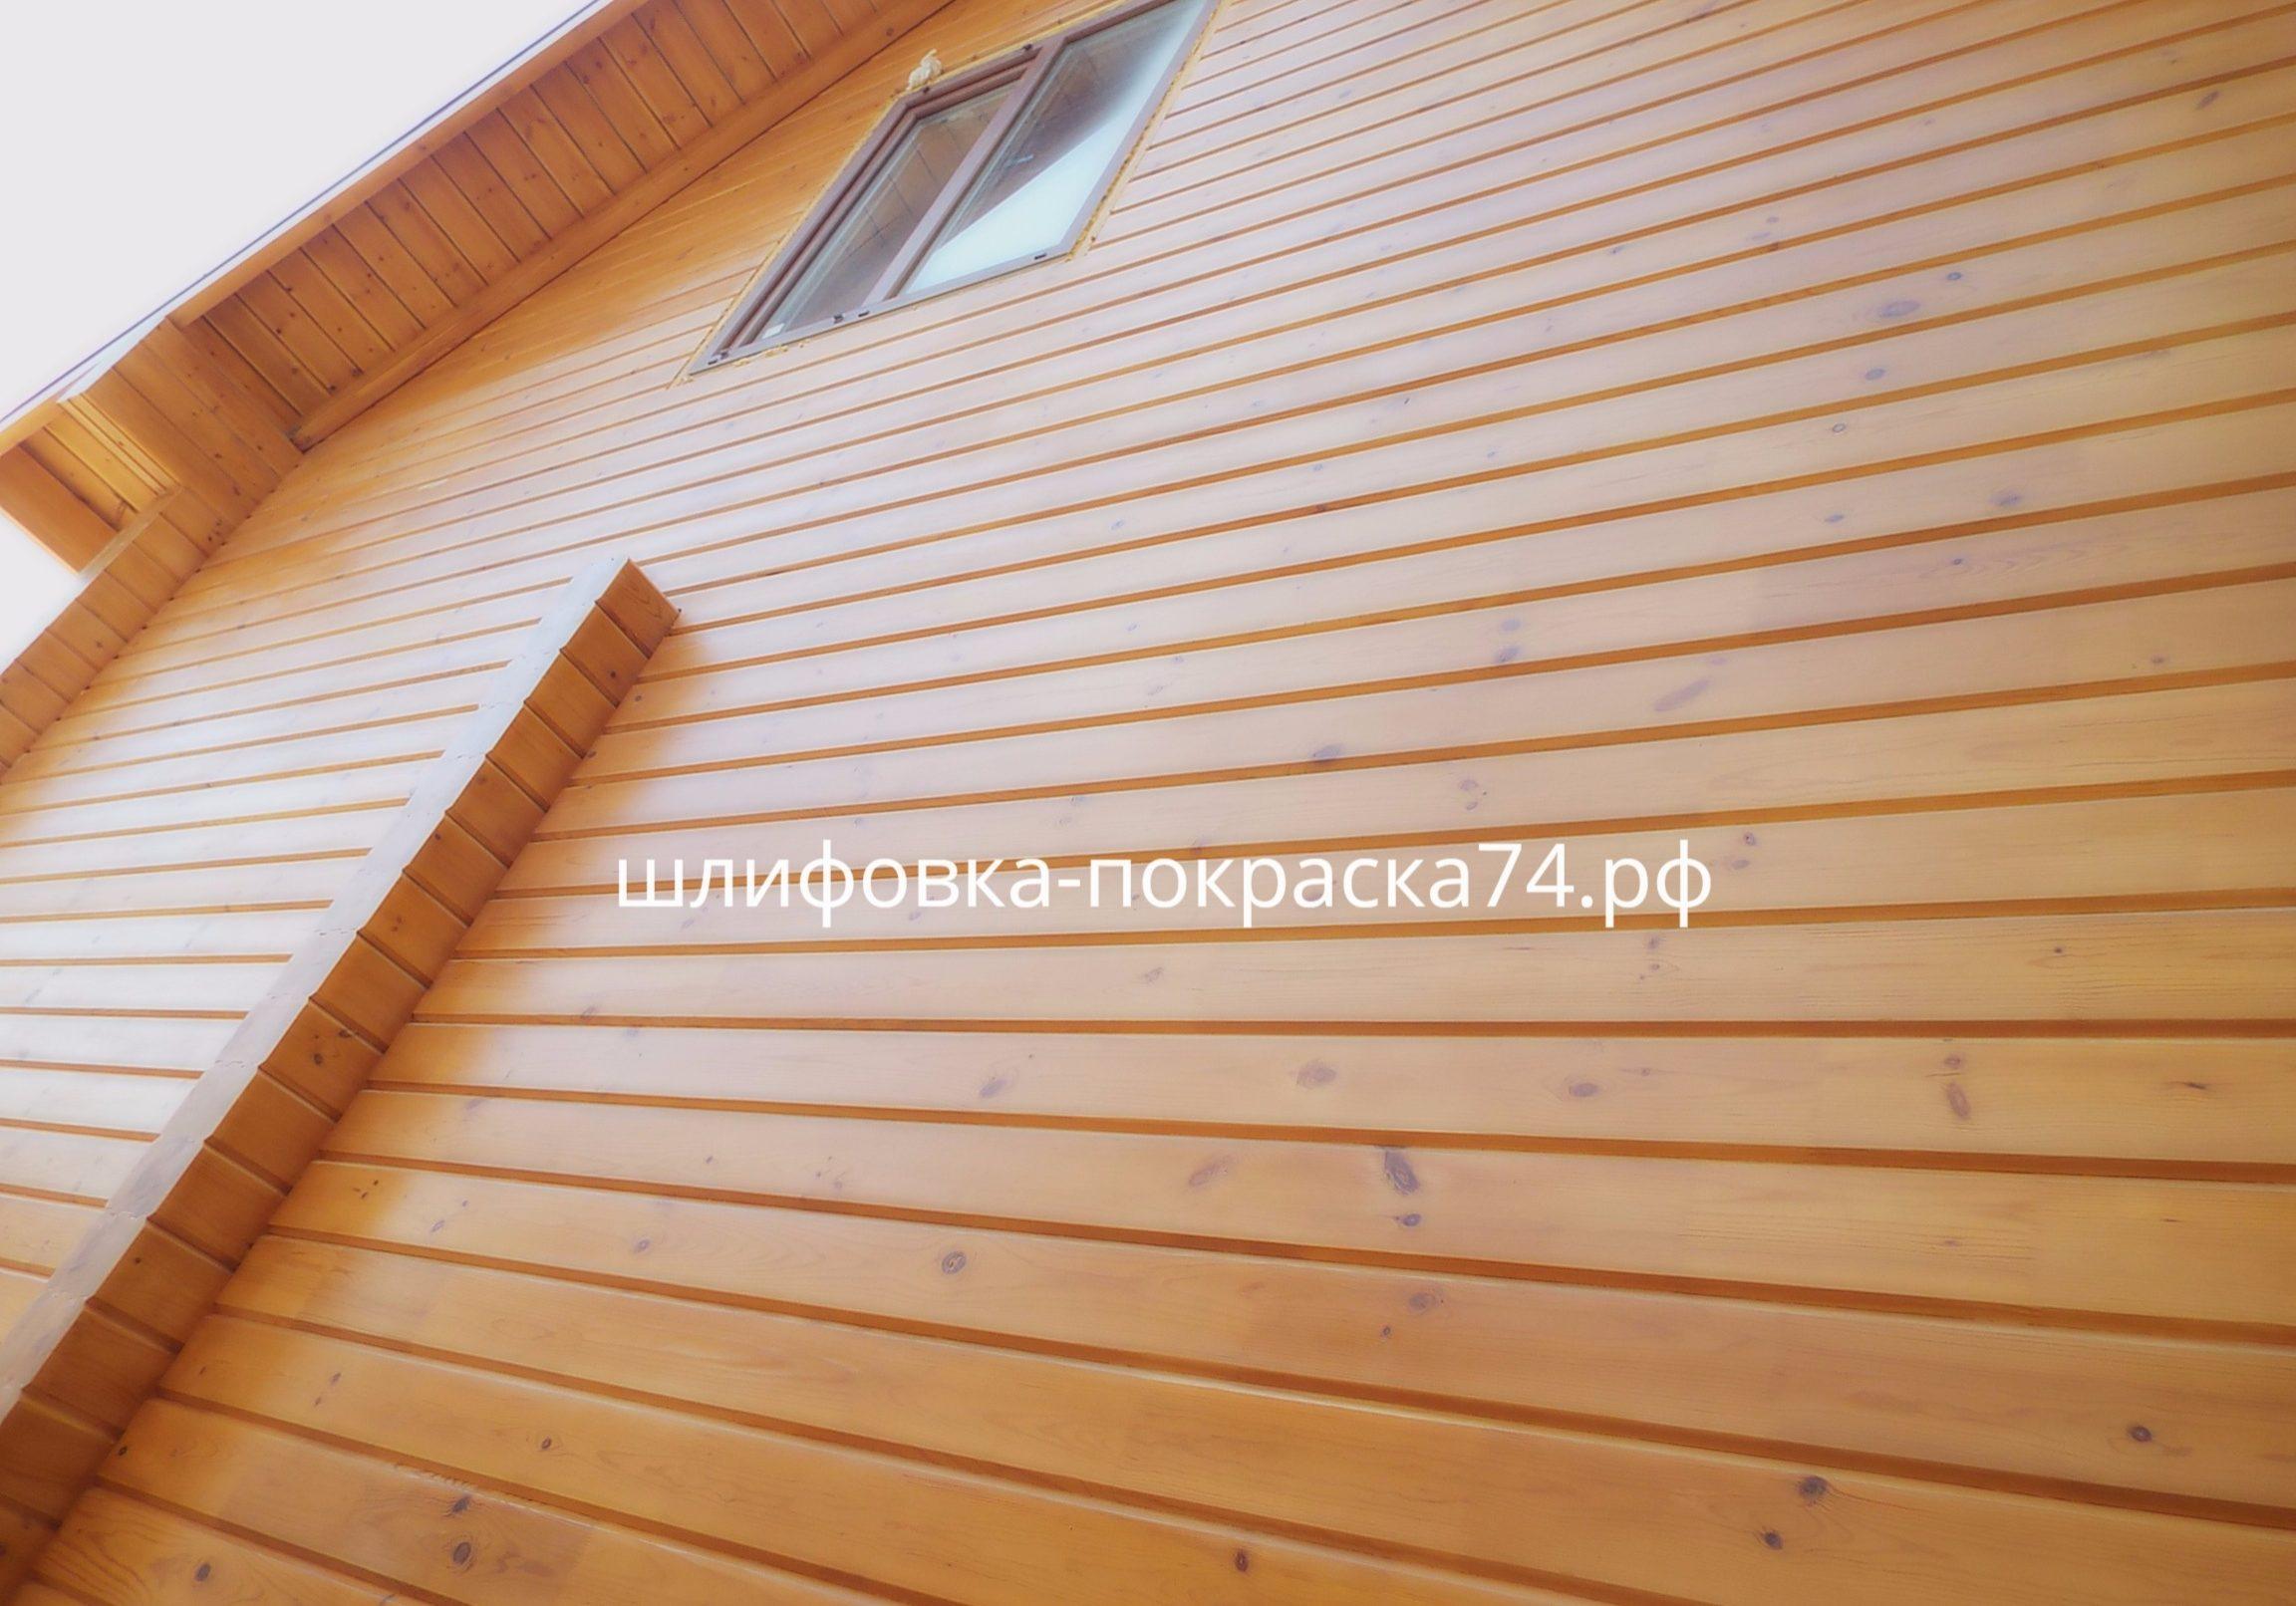 d4c7caa9962c78a68437067b4d54302e_gallery